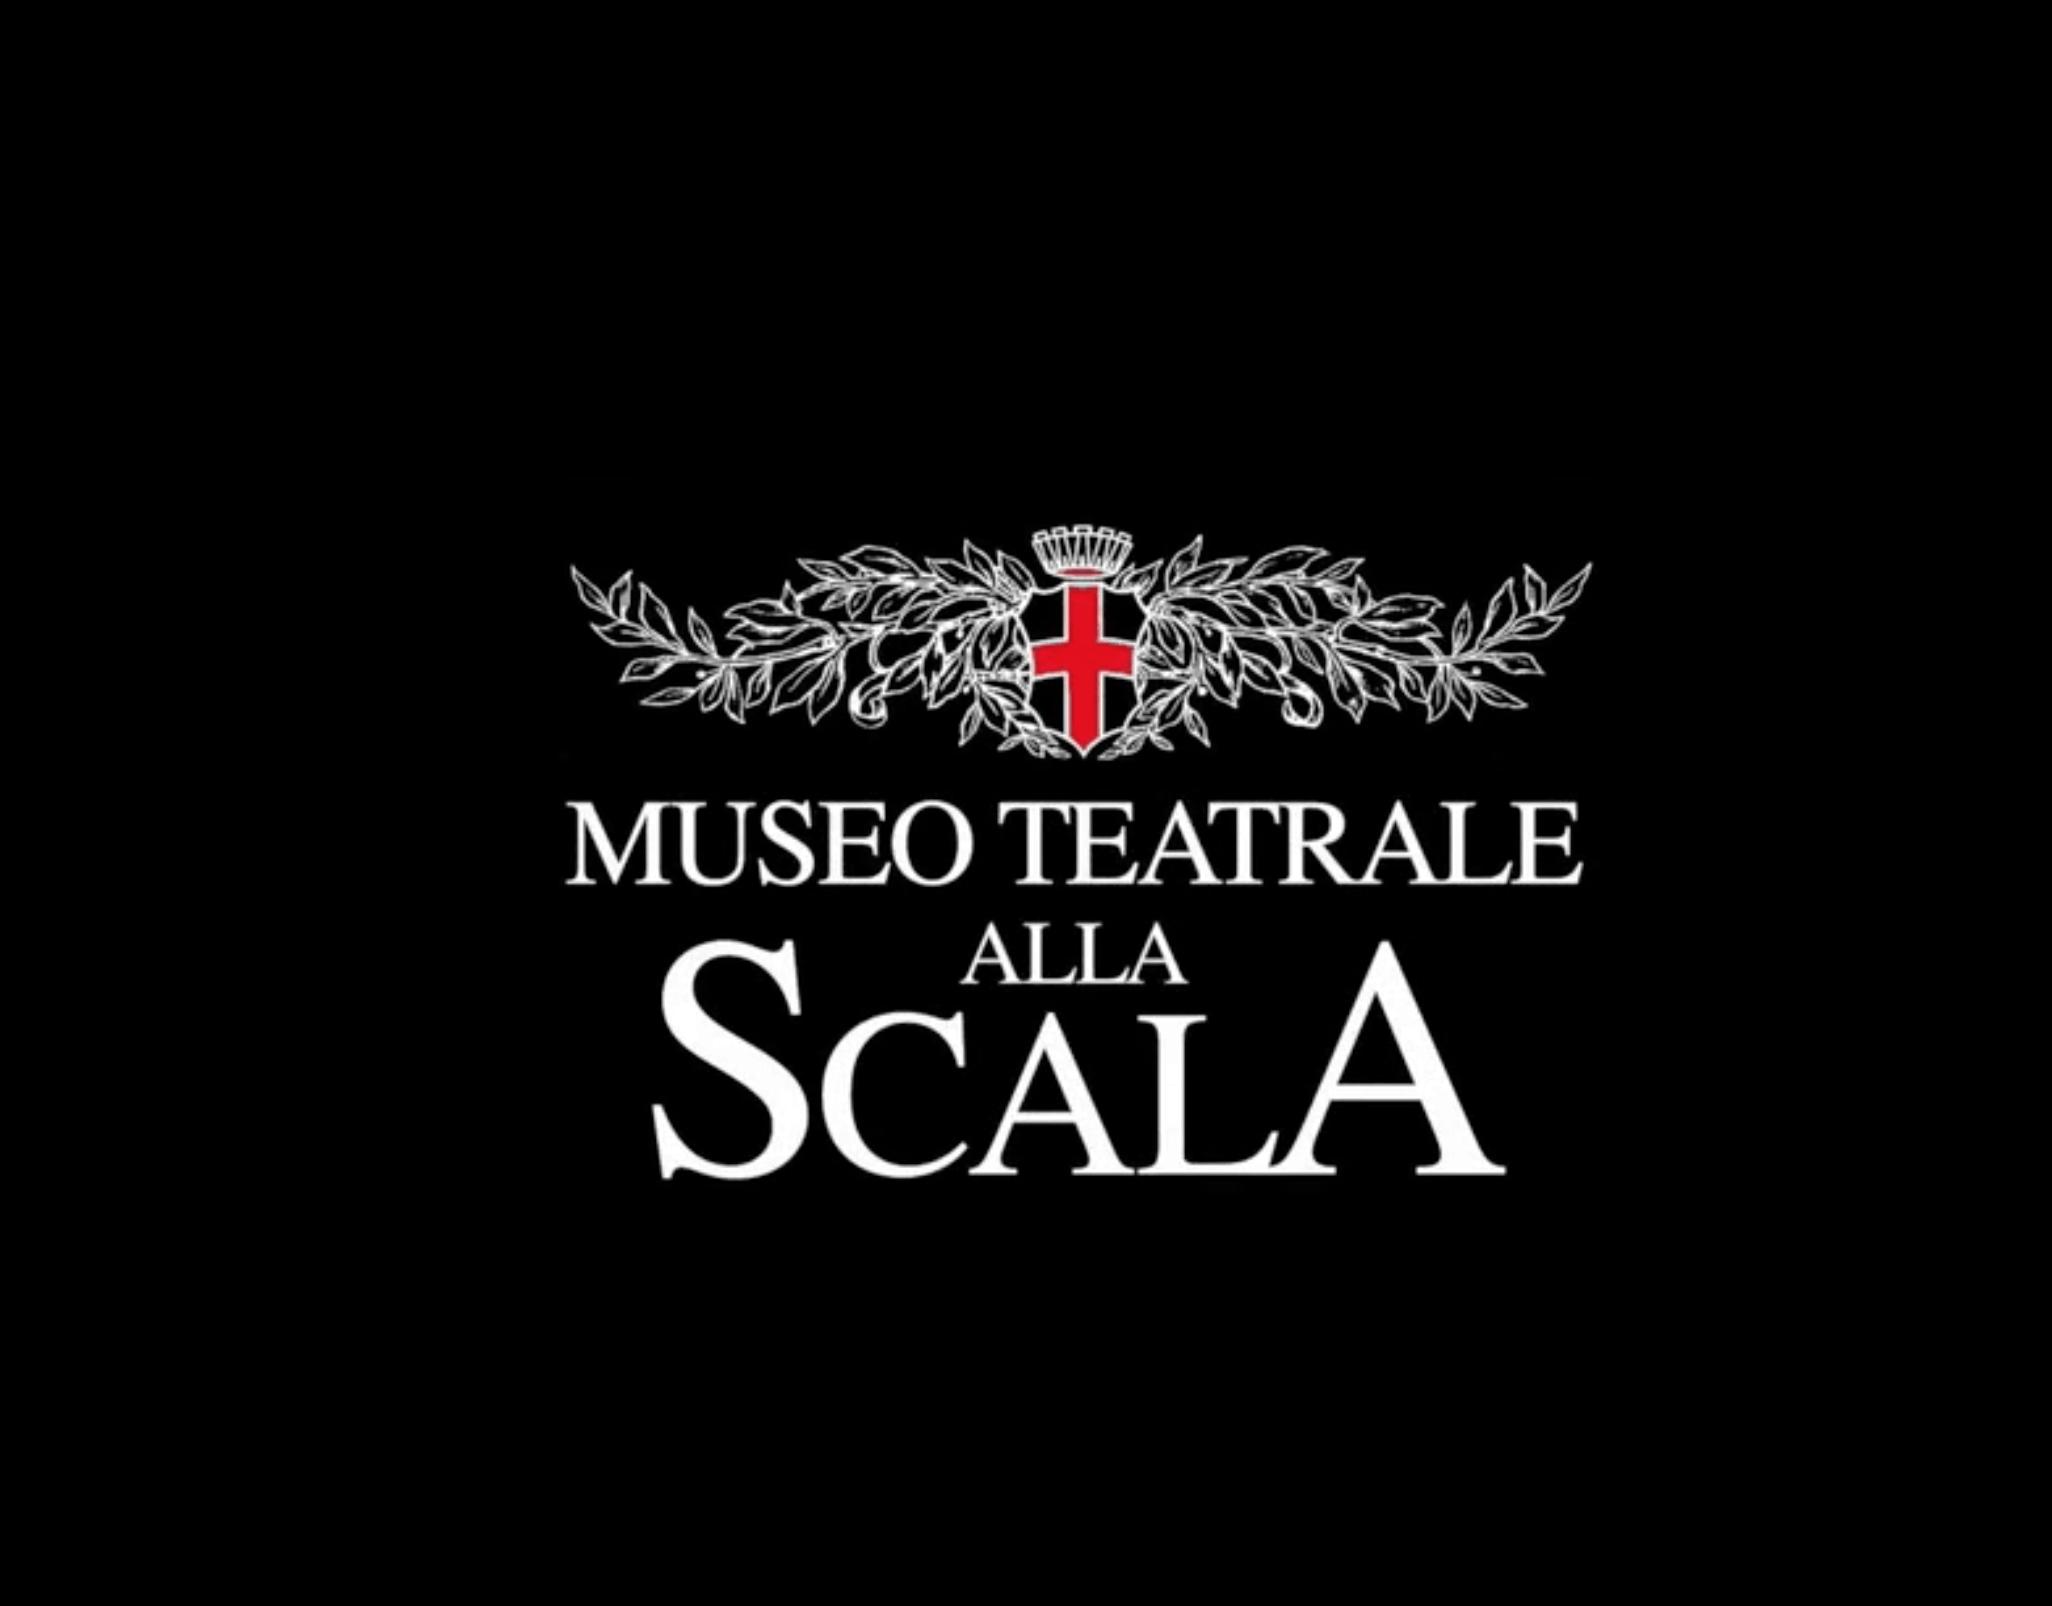 Bonaveri Bust Forms La Scala